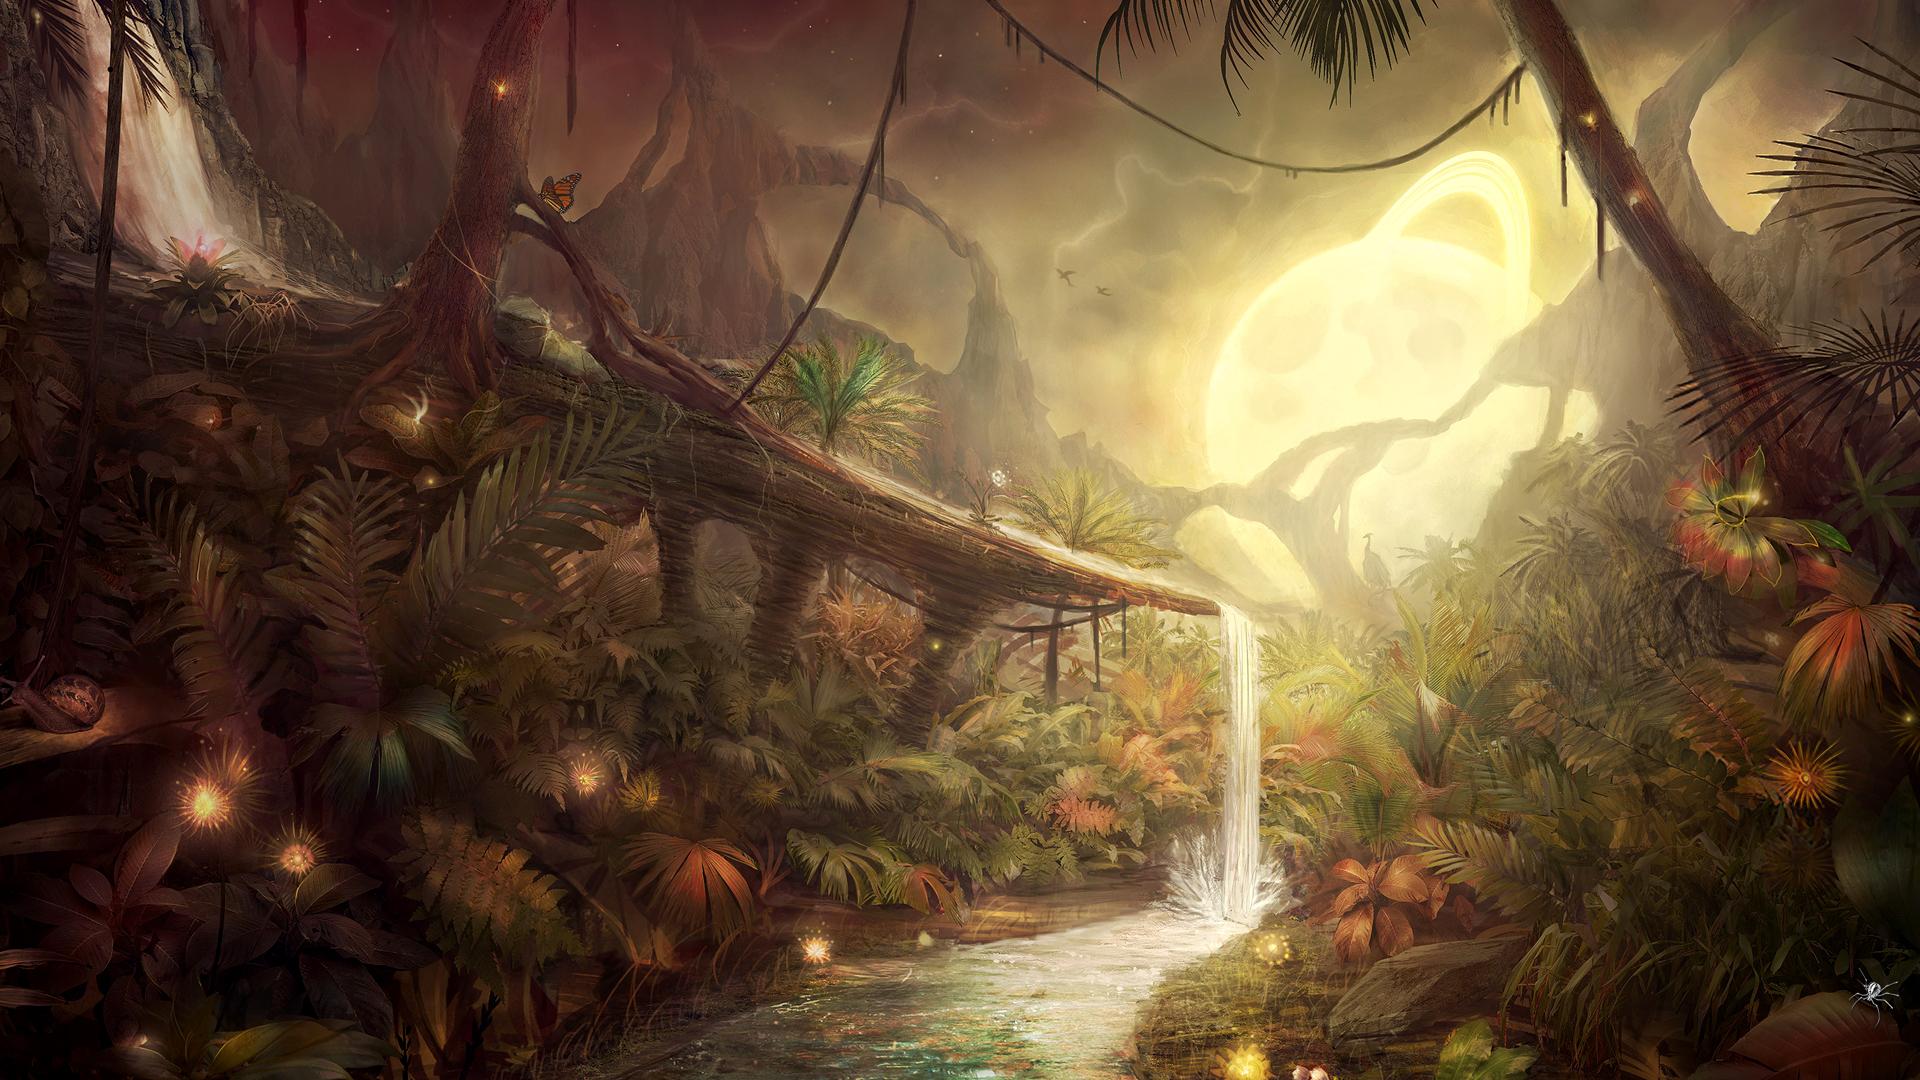 Homepage Fantasy Fantasy wallpaper 1920x1080 13 1920x1080